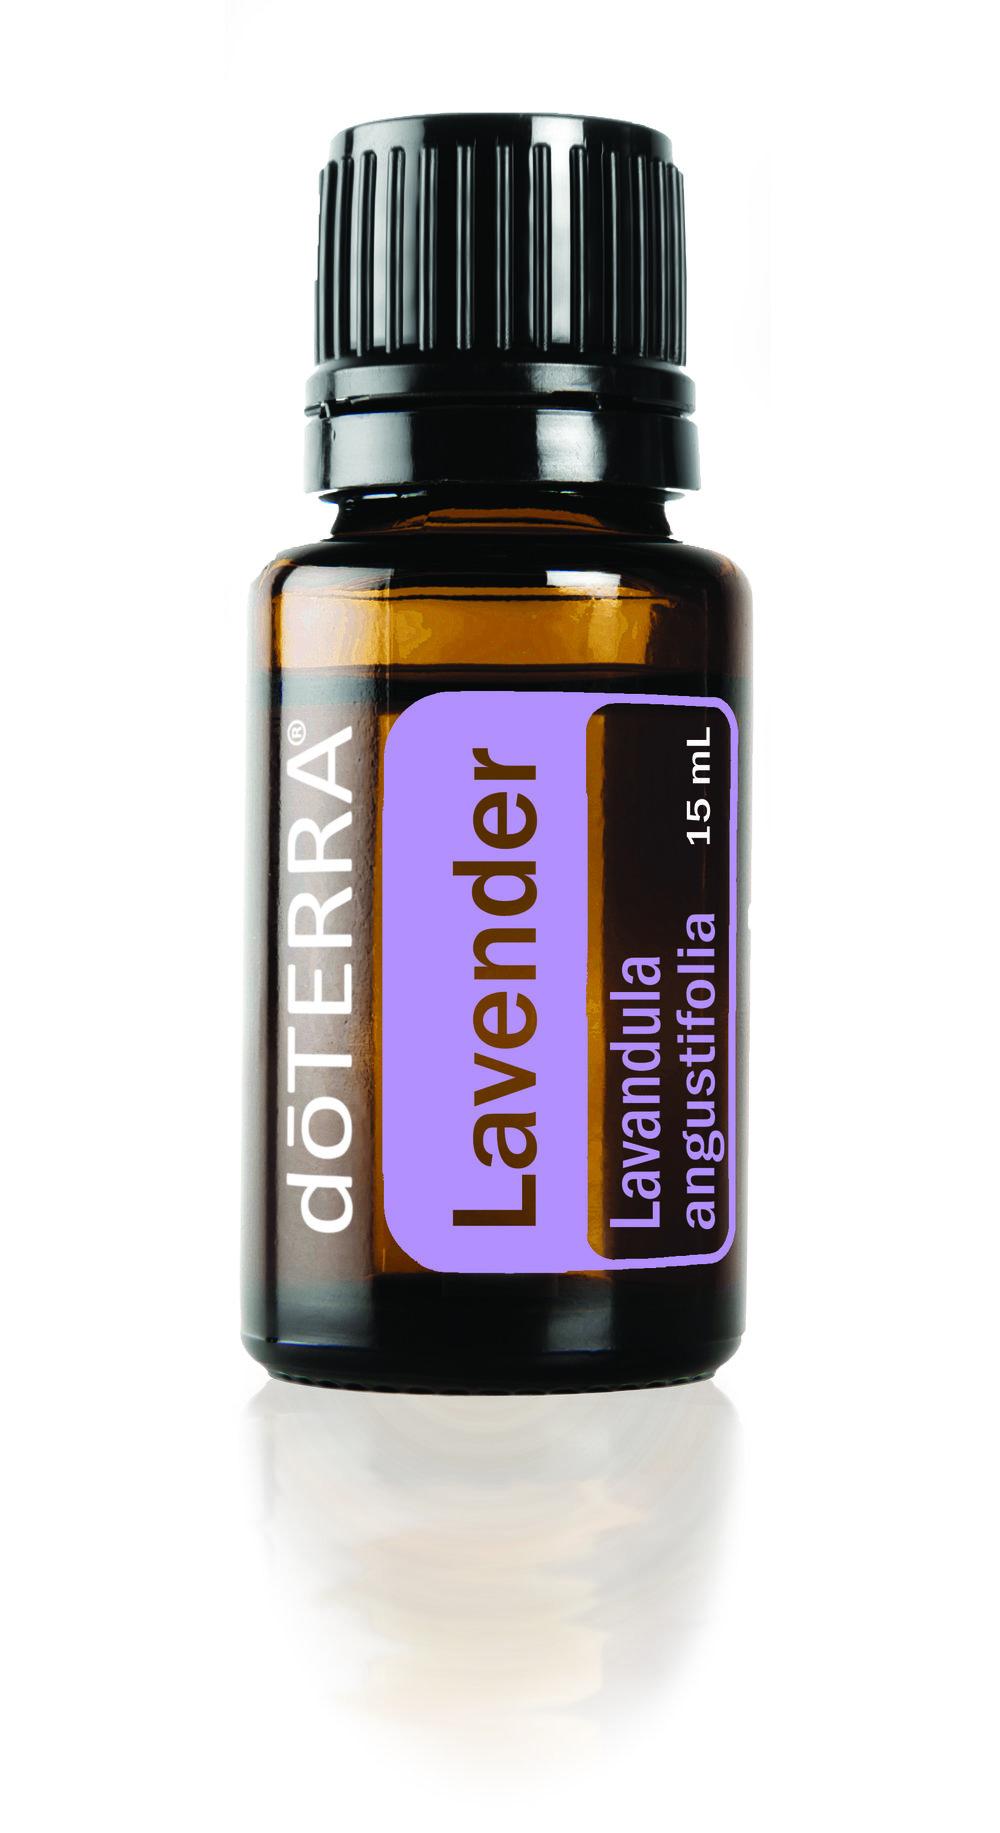 flex5-aromatherapy-essential-oil-doterra-lavender-lavandula-angustifolia-blend-15ml-charlotte-nc